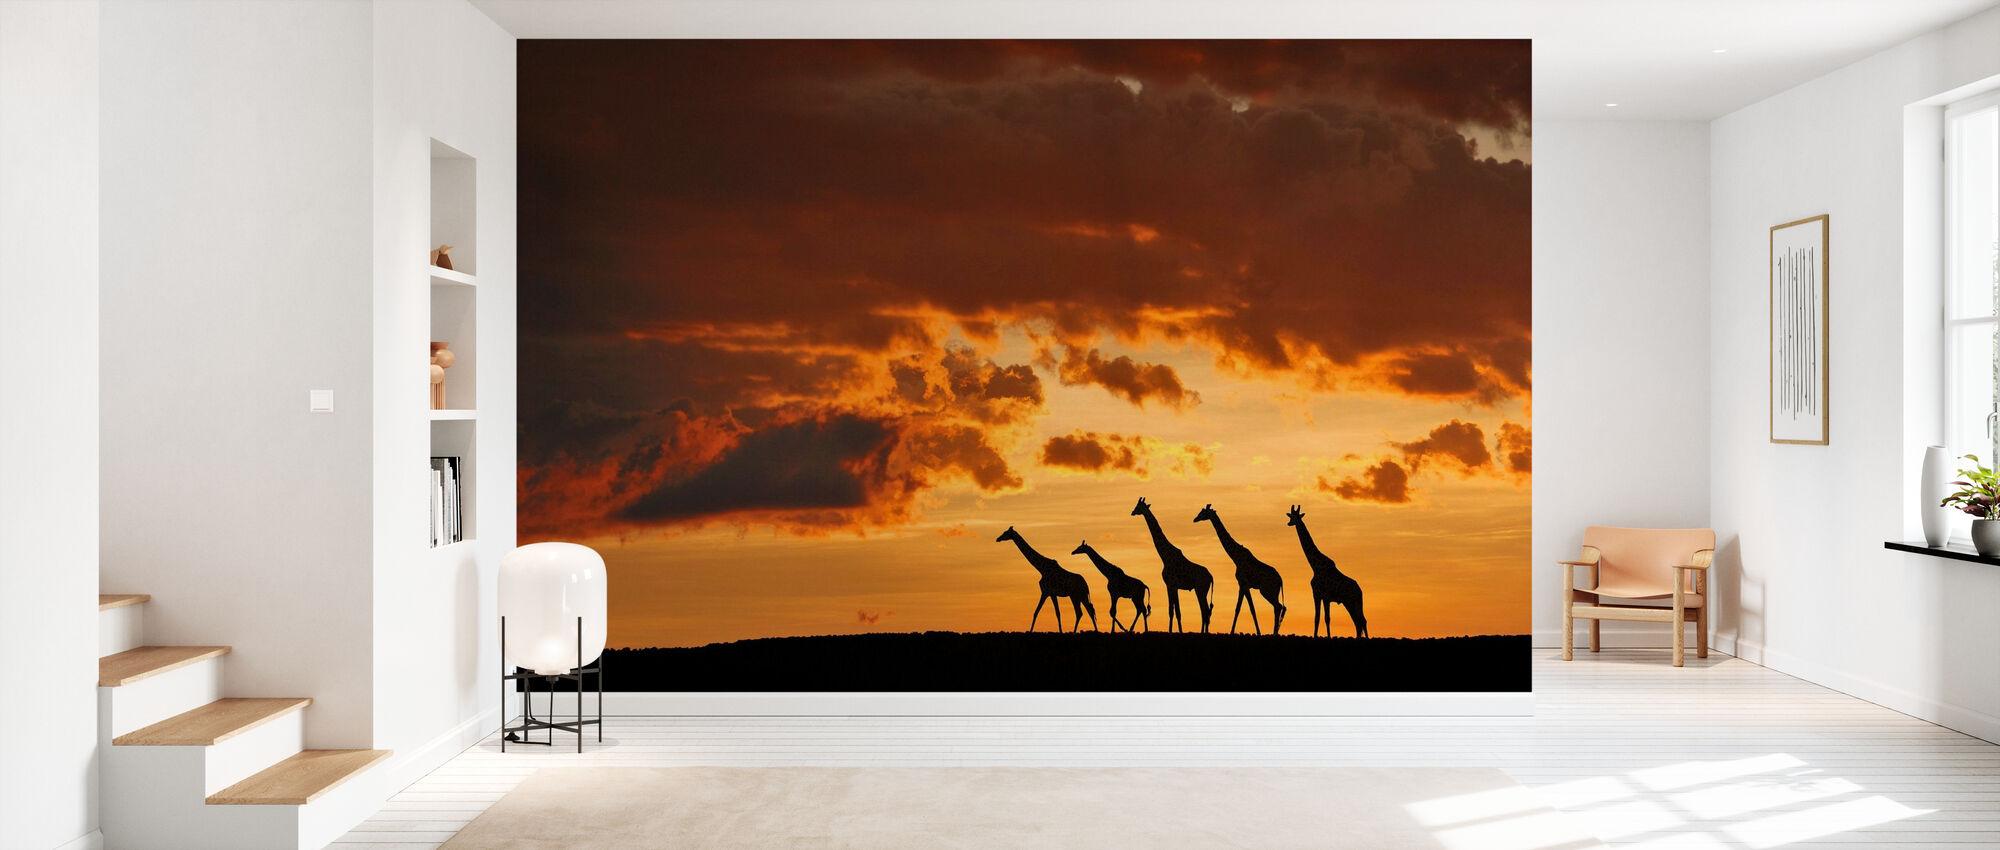 Viisi kirahvia - Tapetti - Aula